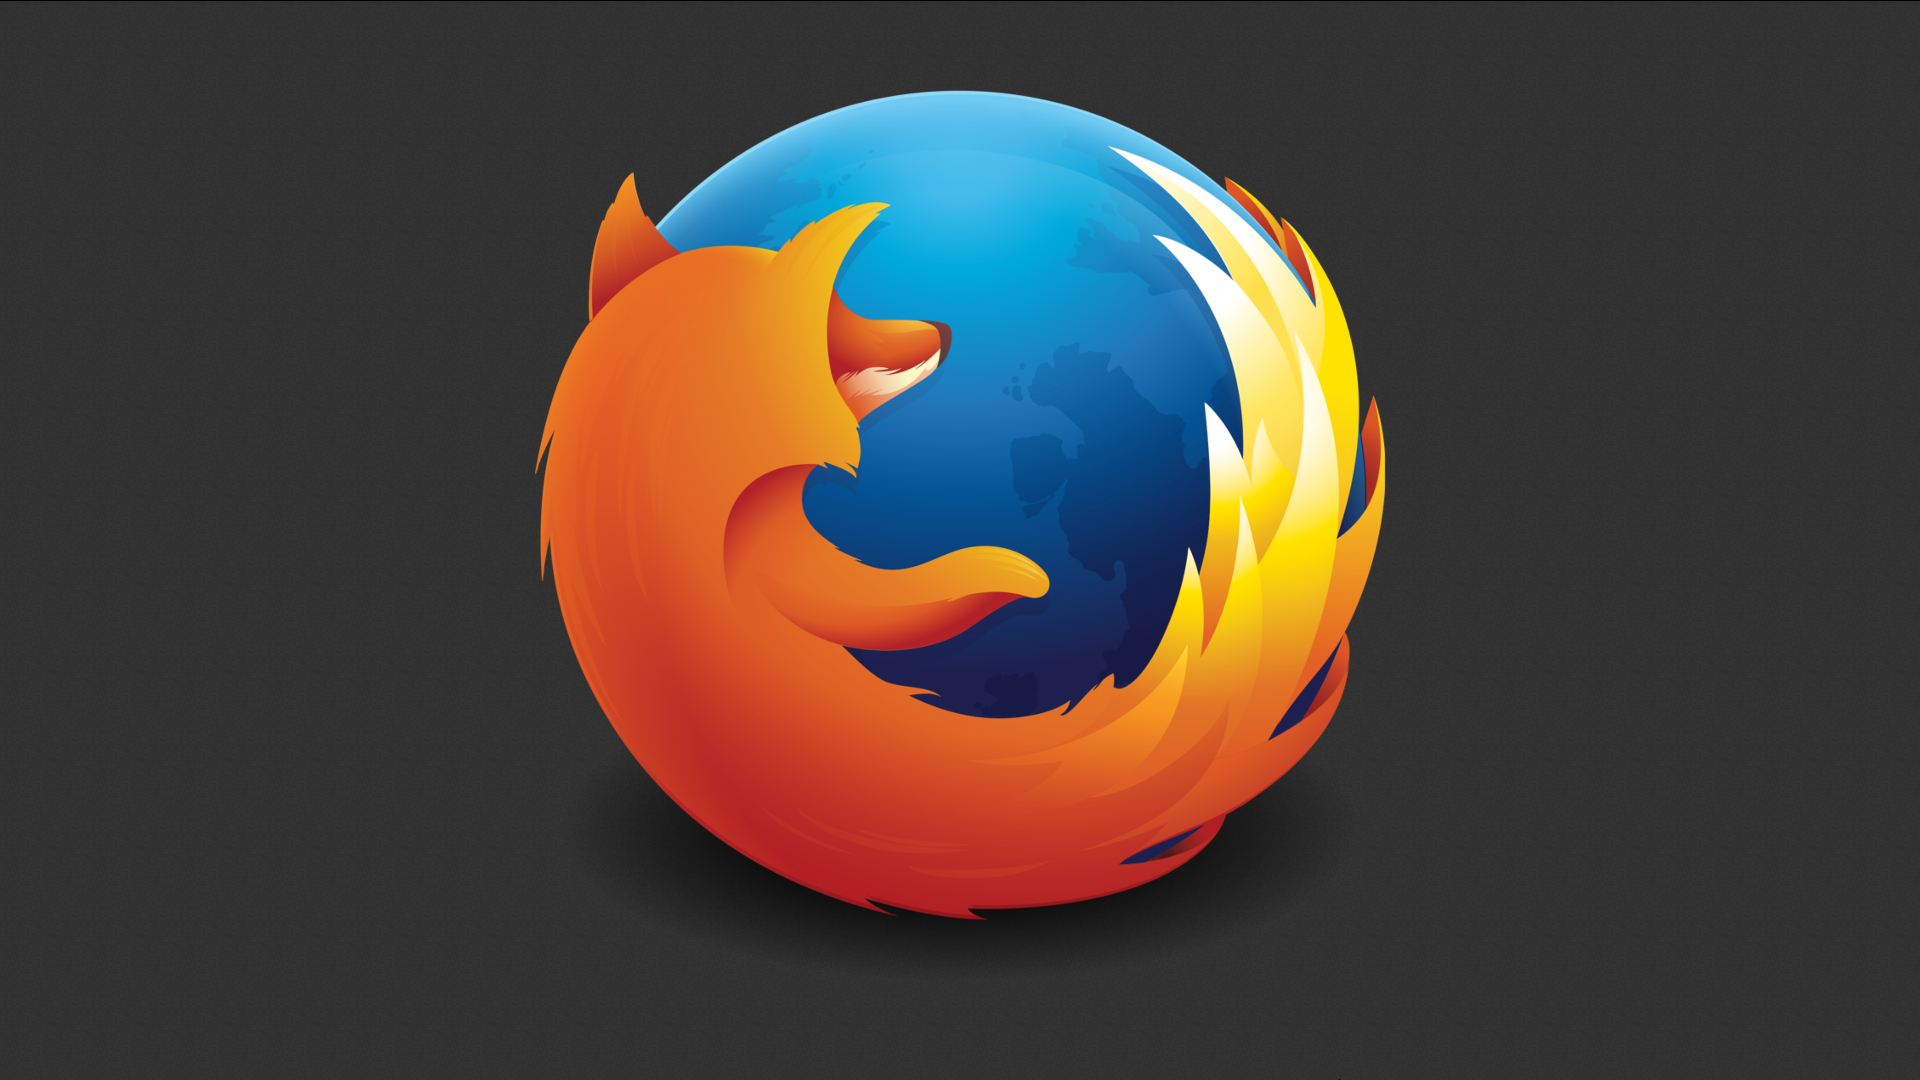 General 1920x1080 Mozilla Firefox logo simple background